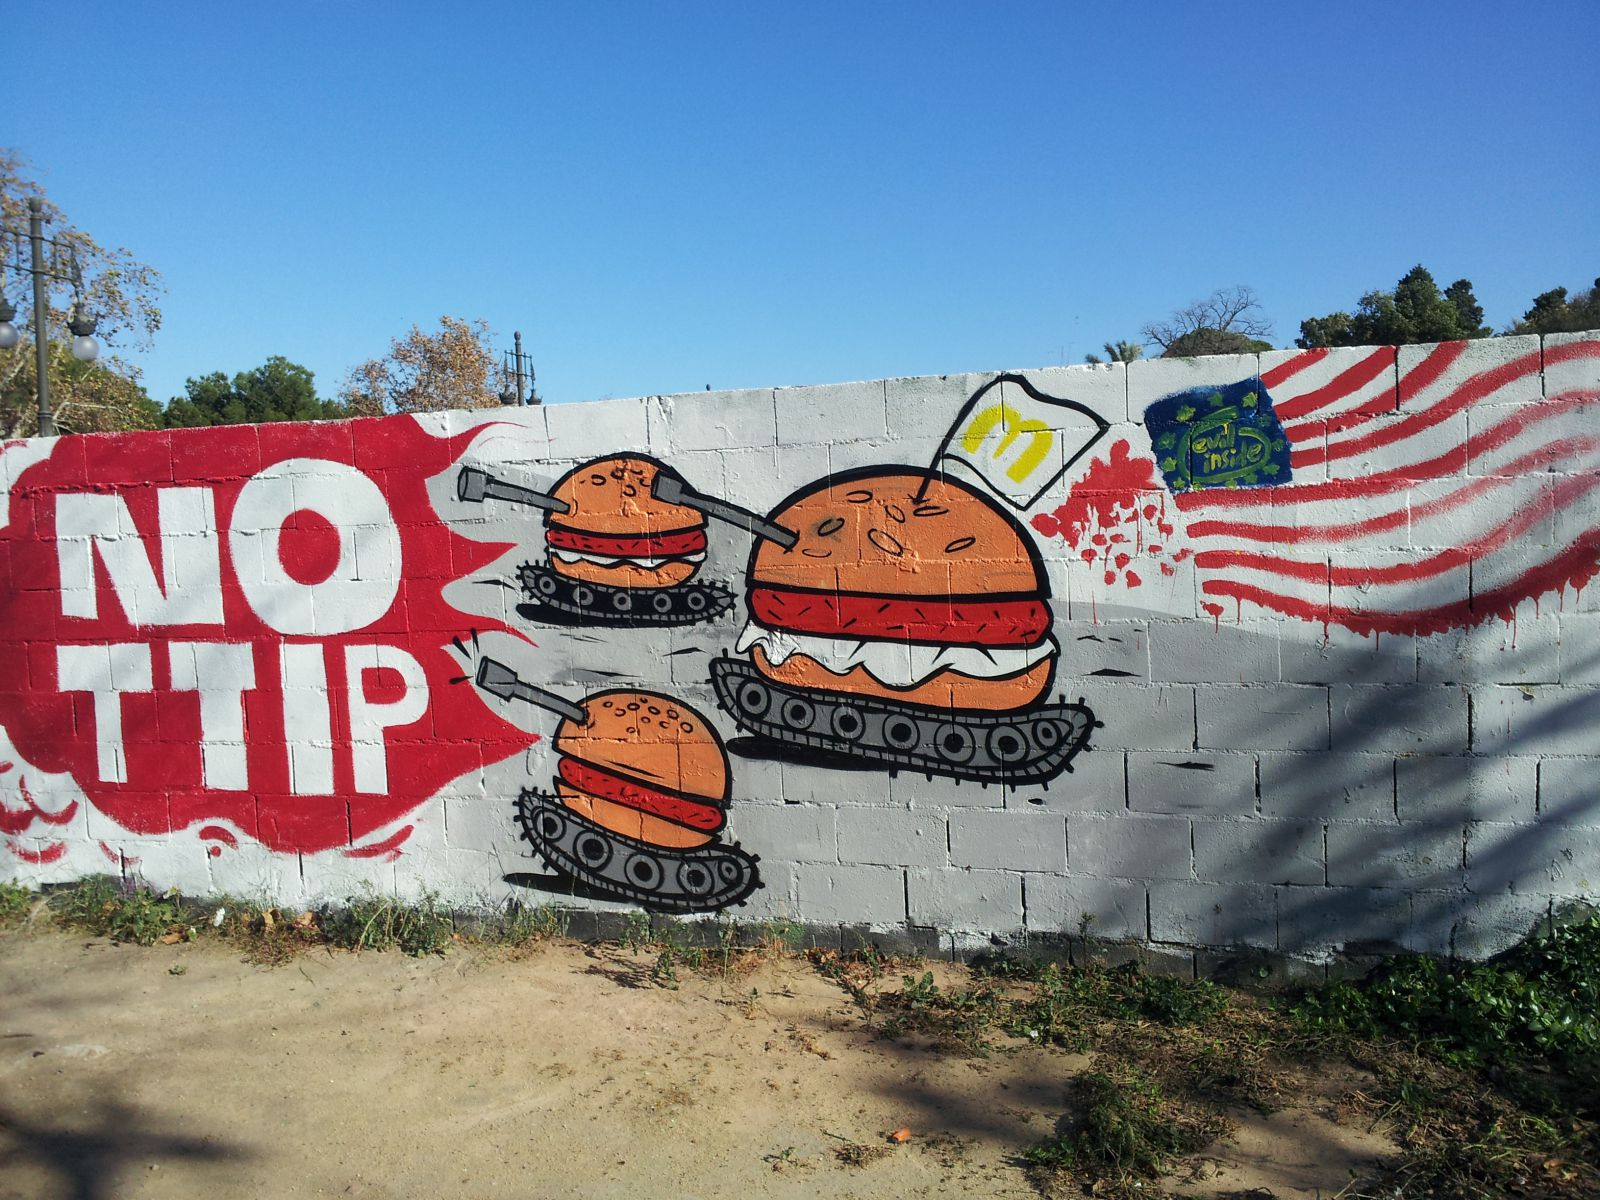 TTIP graffiti in Valencia